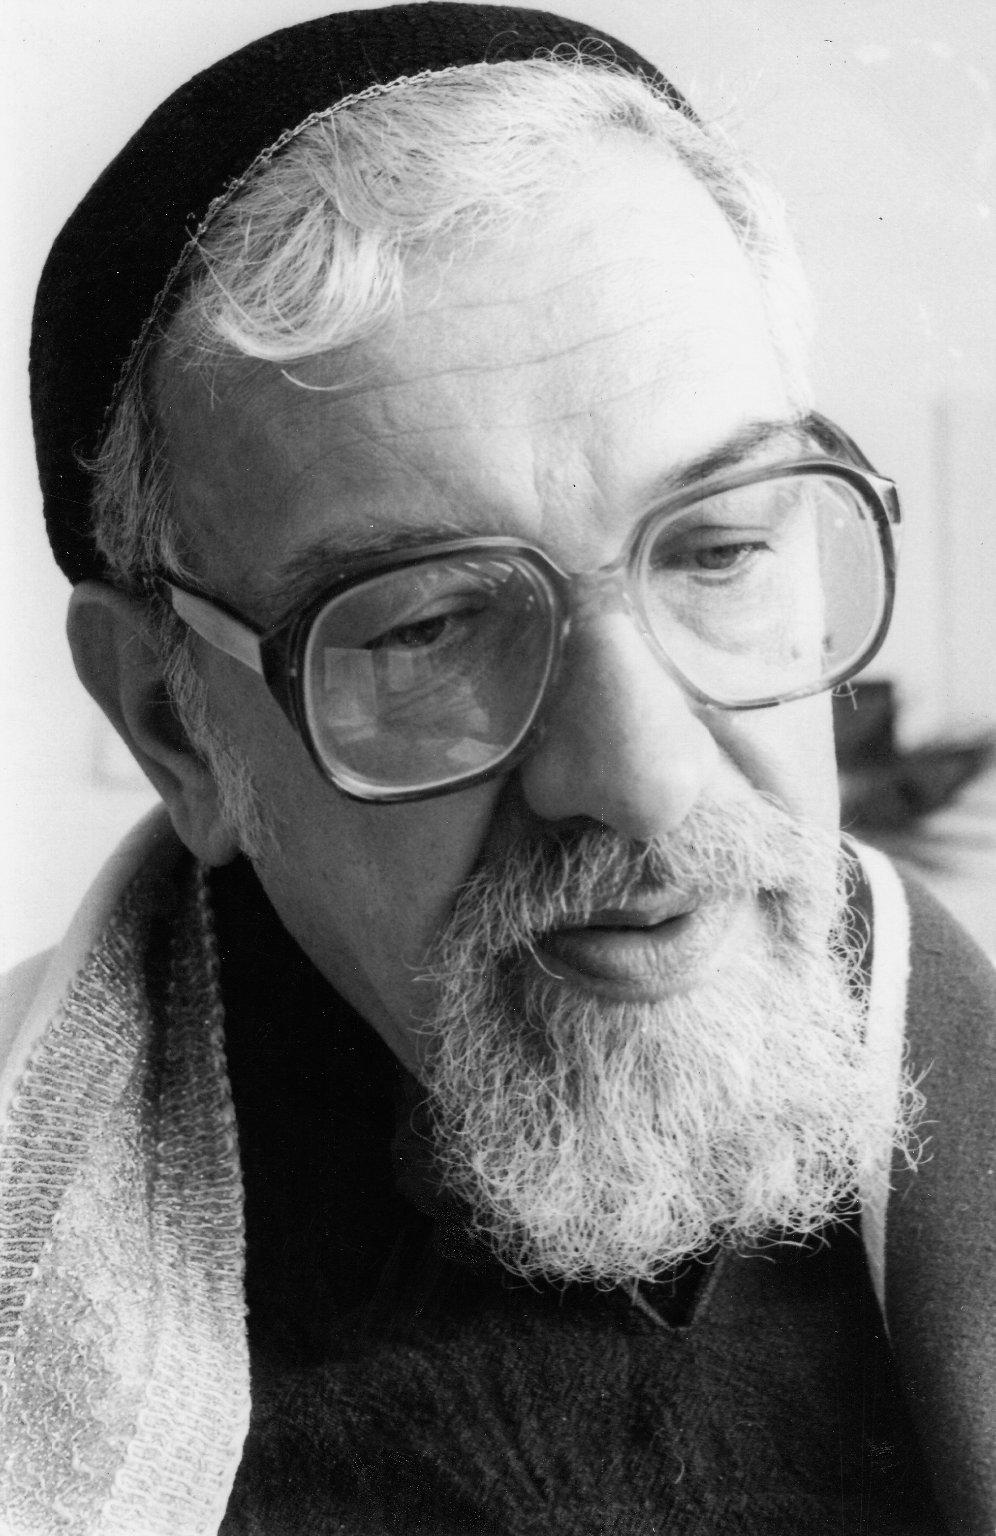 Rabbi Zalman Schachter-Shalomi, ca. 1980s.